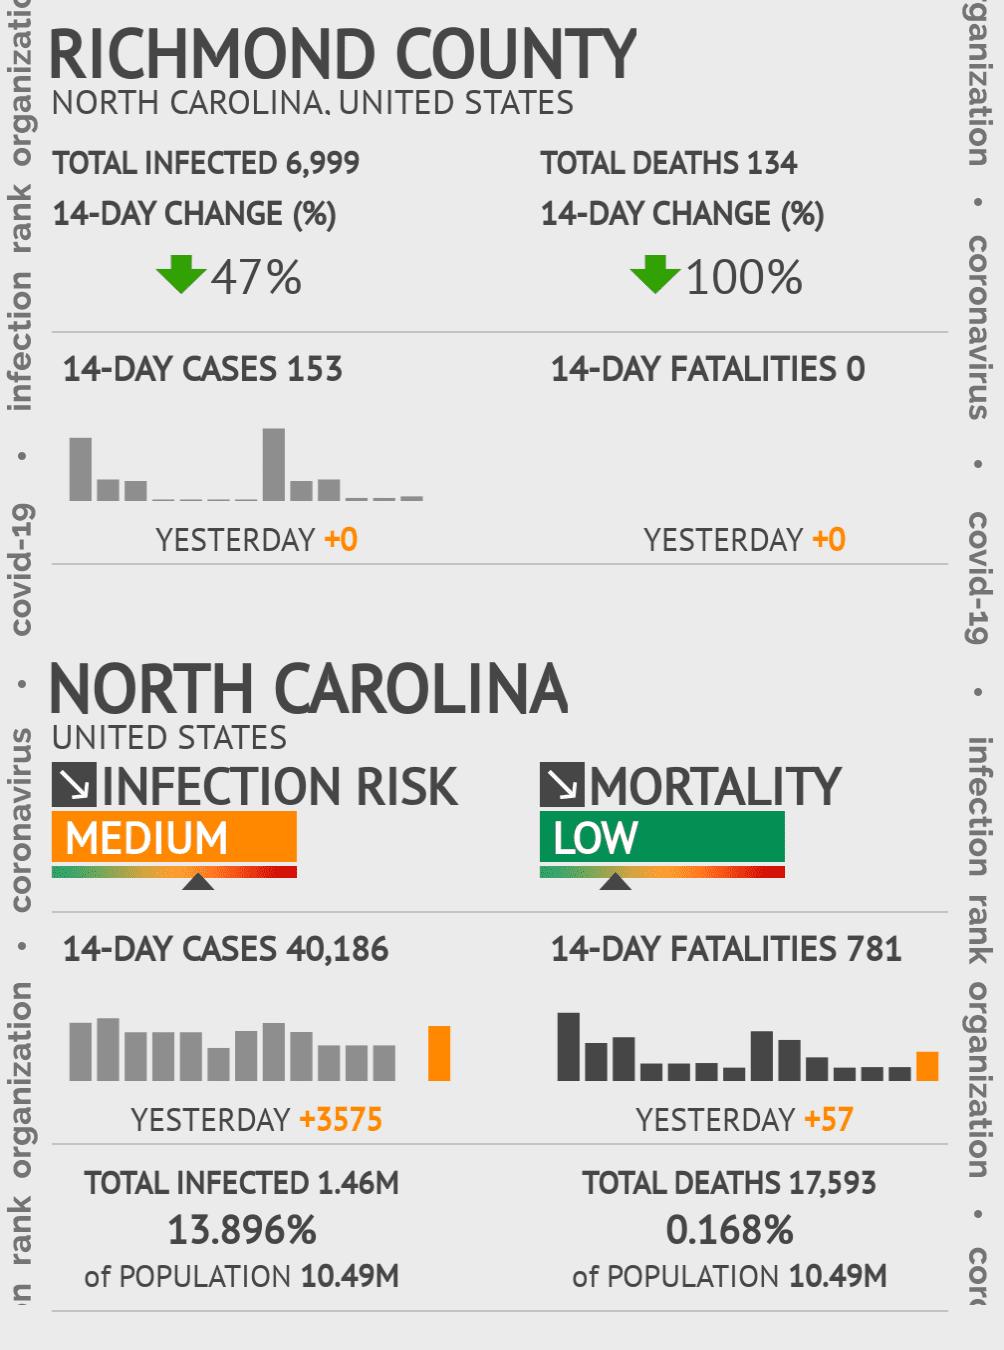 Richmond County Coronavirus Covid-19 Risk of Infection on November 23, 2020